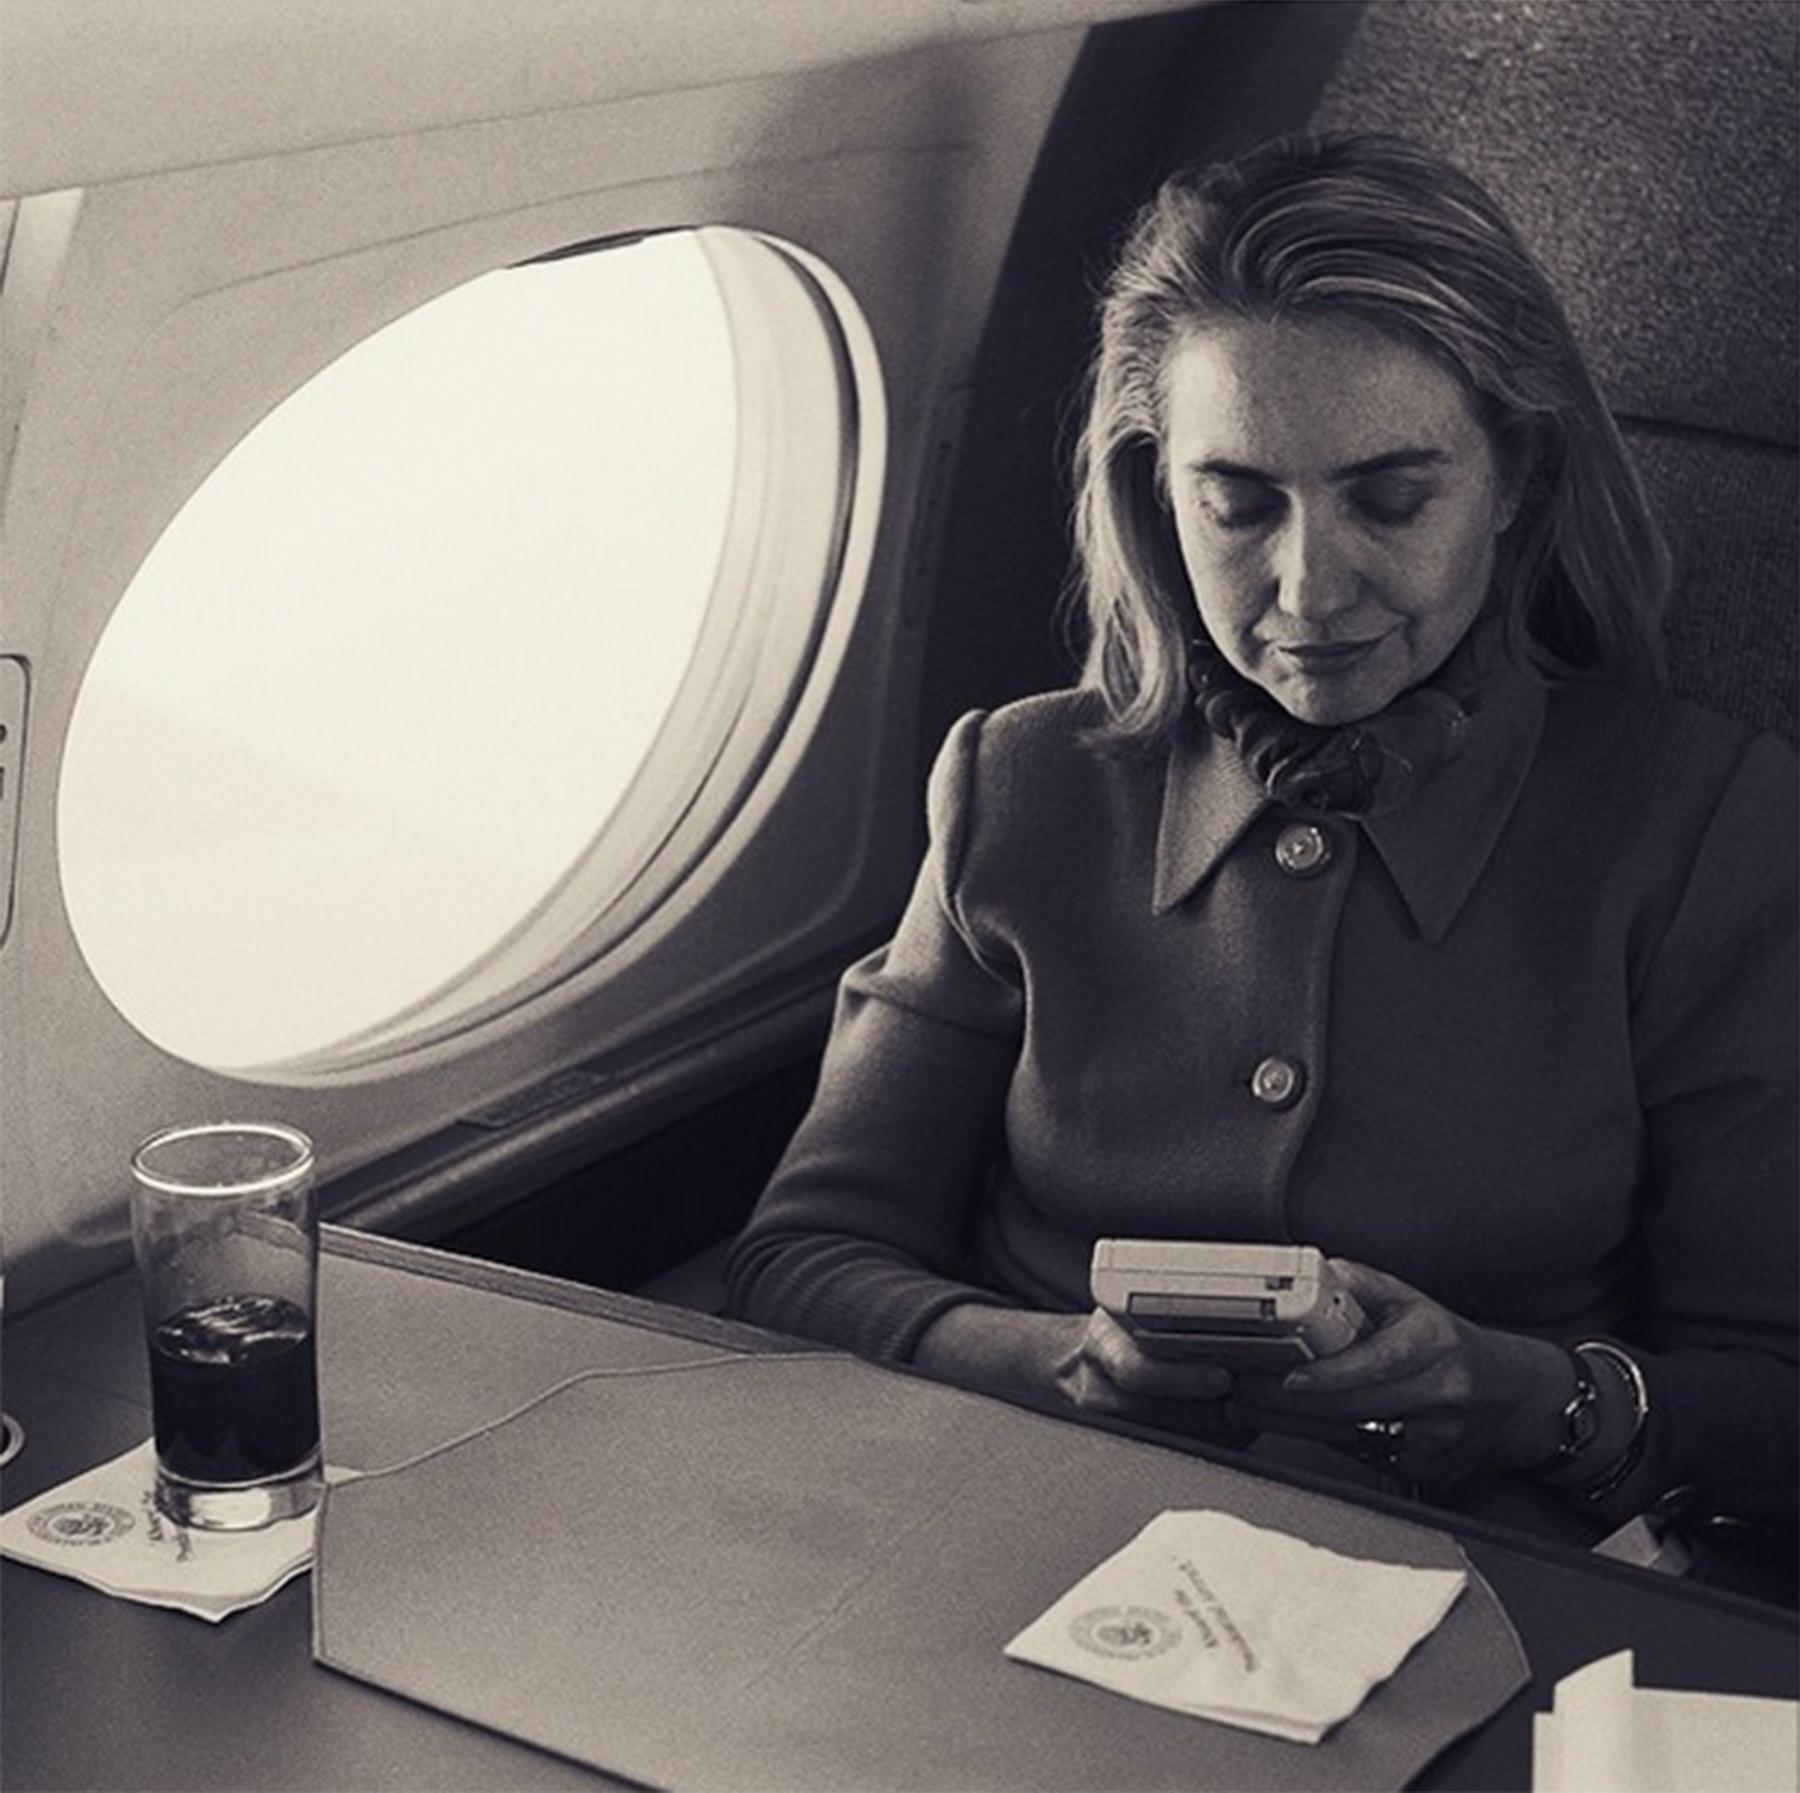 Hillary Clinton on Gameboy